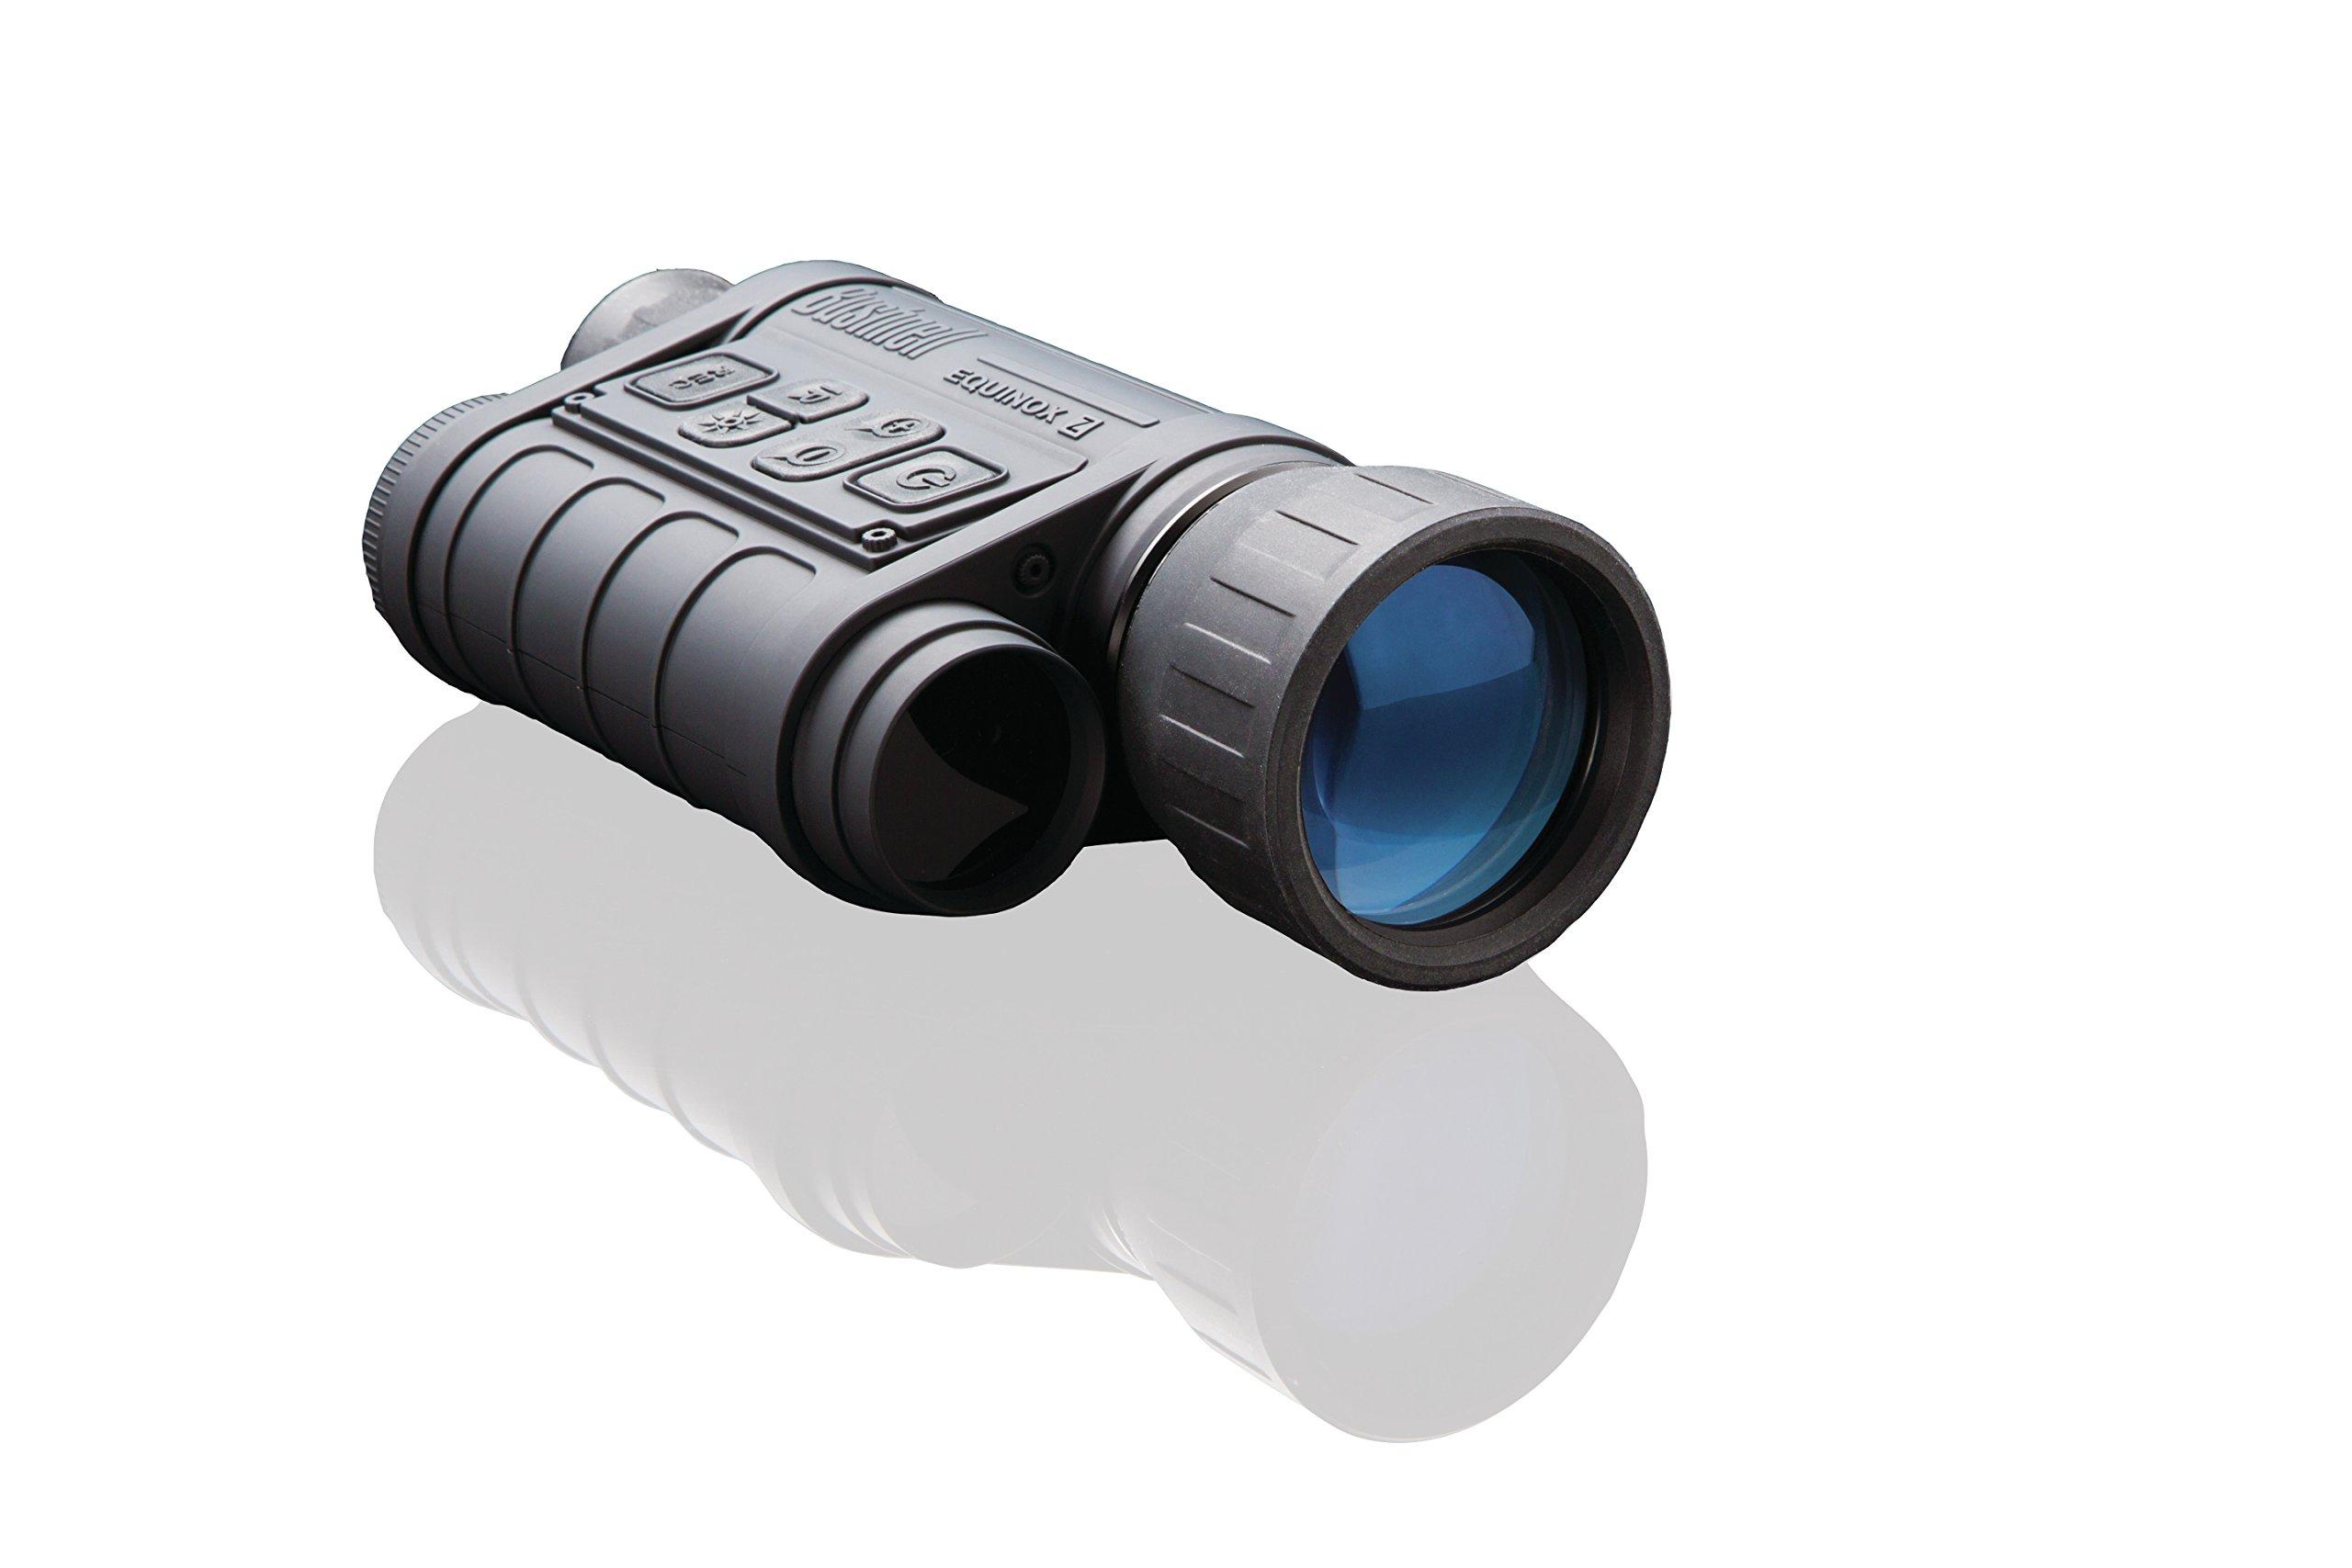 Bushnell Equinox Z Digital Night Vision Monocular, 3 x 30mm by Bushnell (Image #1)